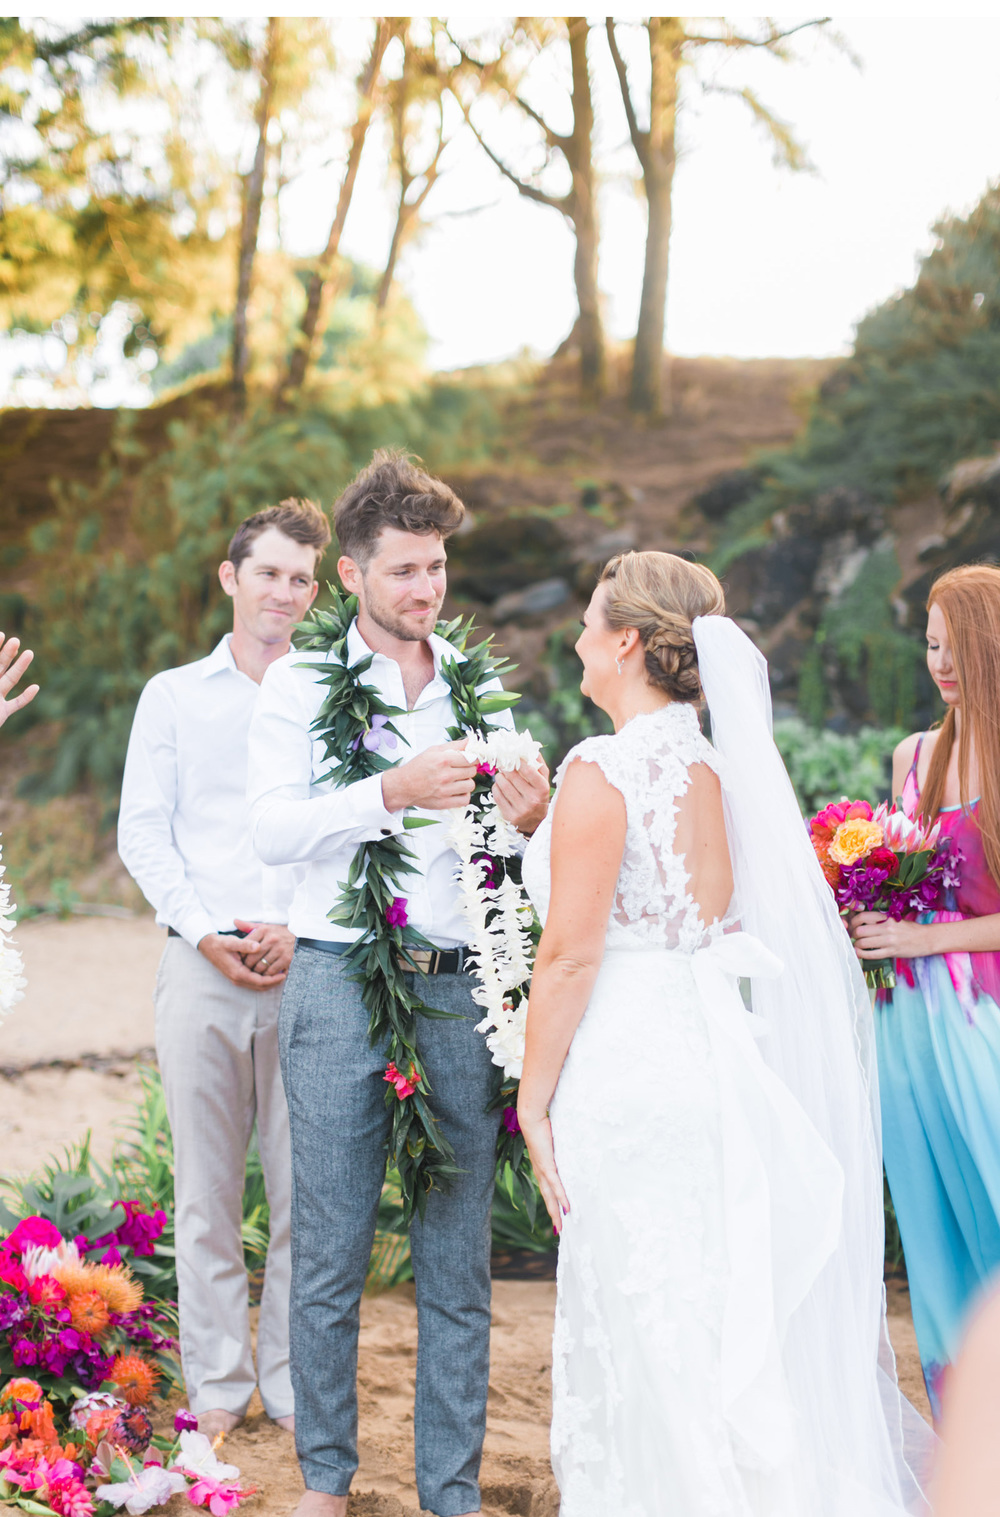 Natalie-Schutt-Photography--Central-Coast-Wedding-Photographer_01.jpg